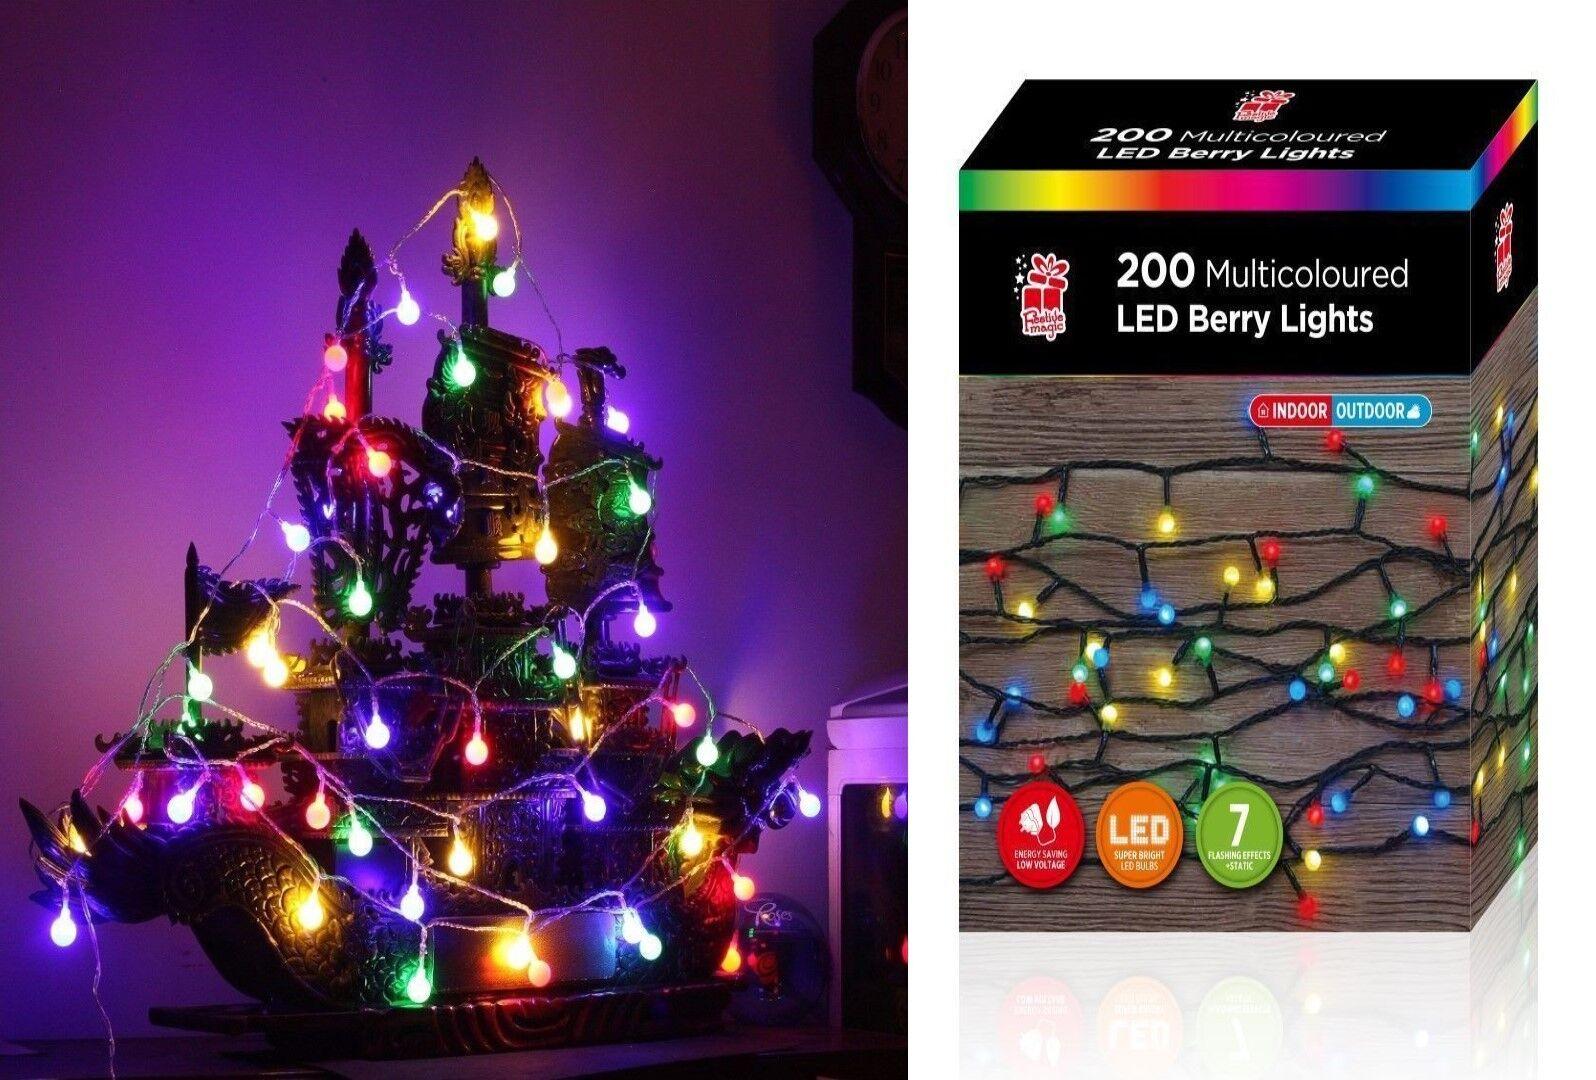 200-100 BERRY LED CHRISTMAS LIGHTS XMAS BALL SHAPE FAIRY GIFT MULTI COLOUR IN OU